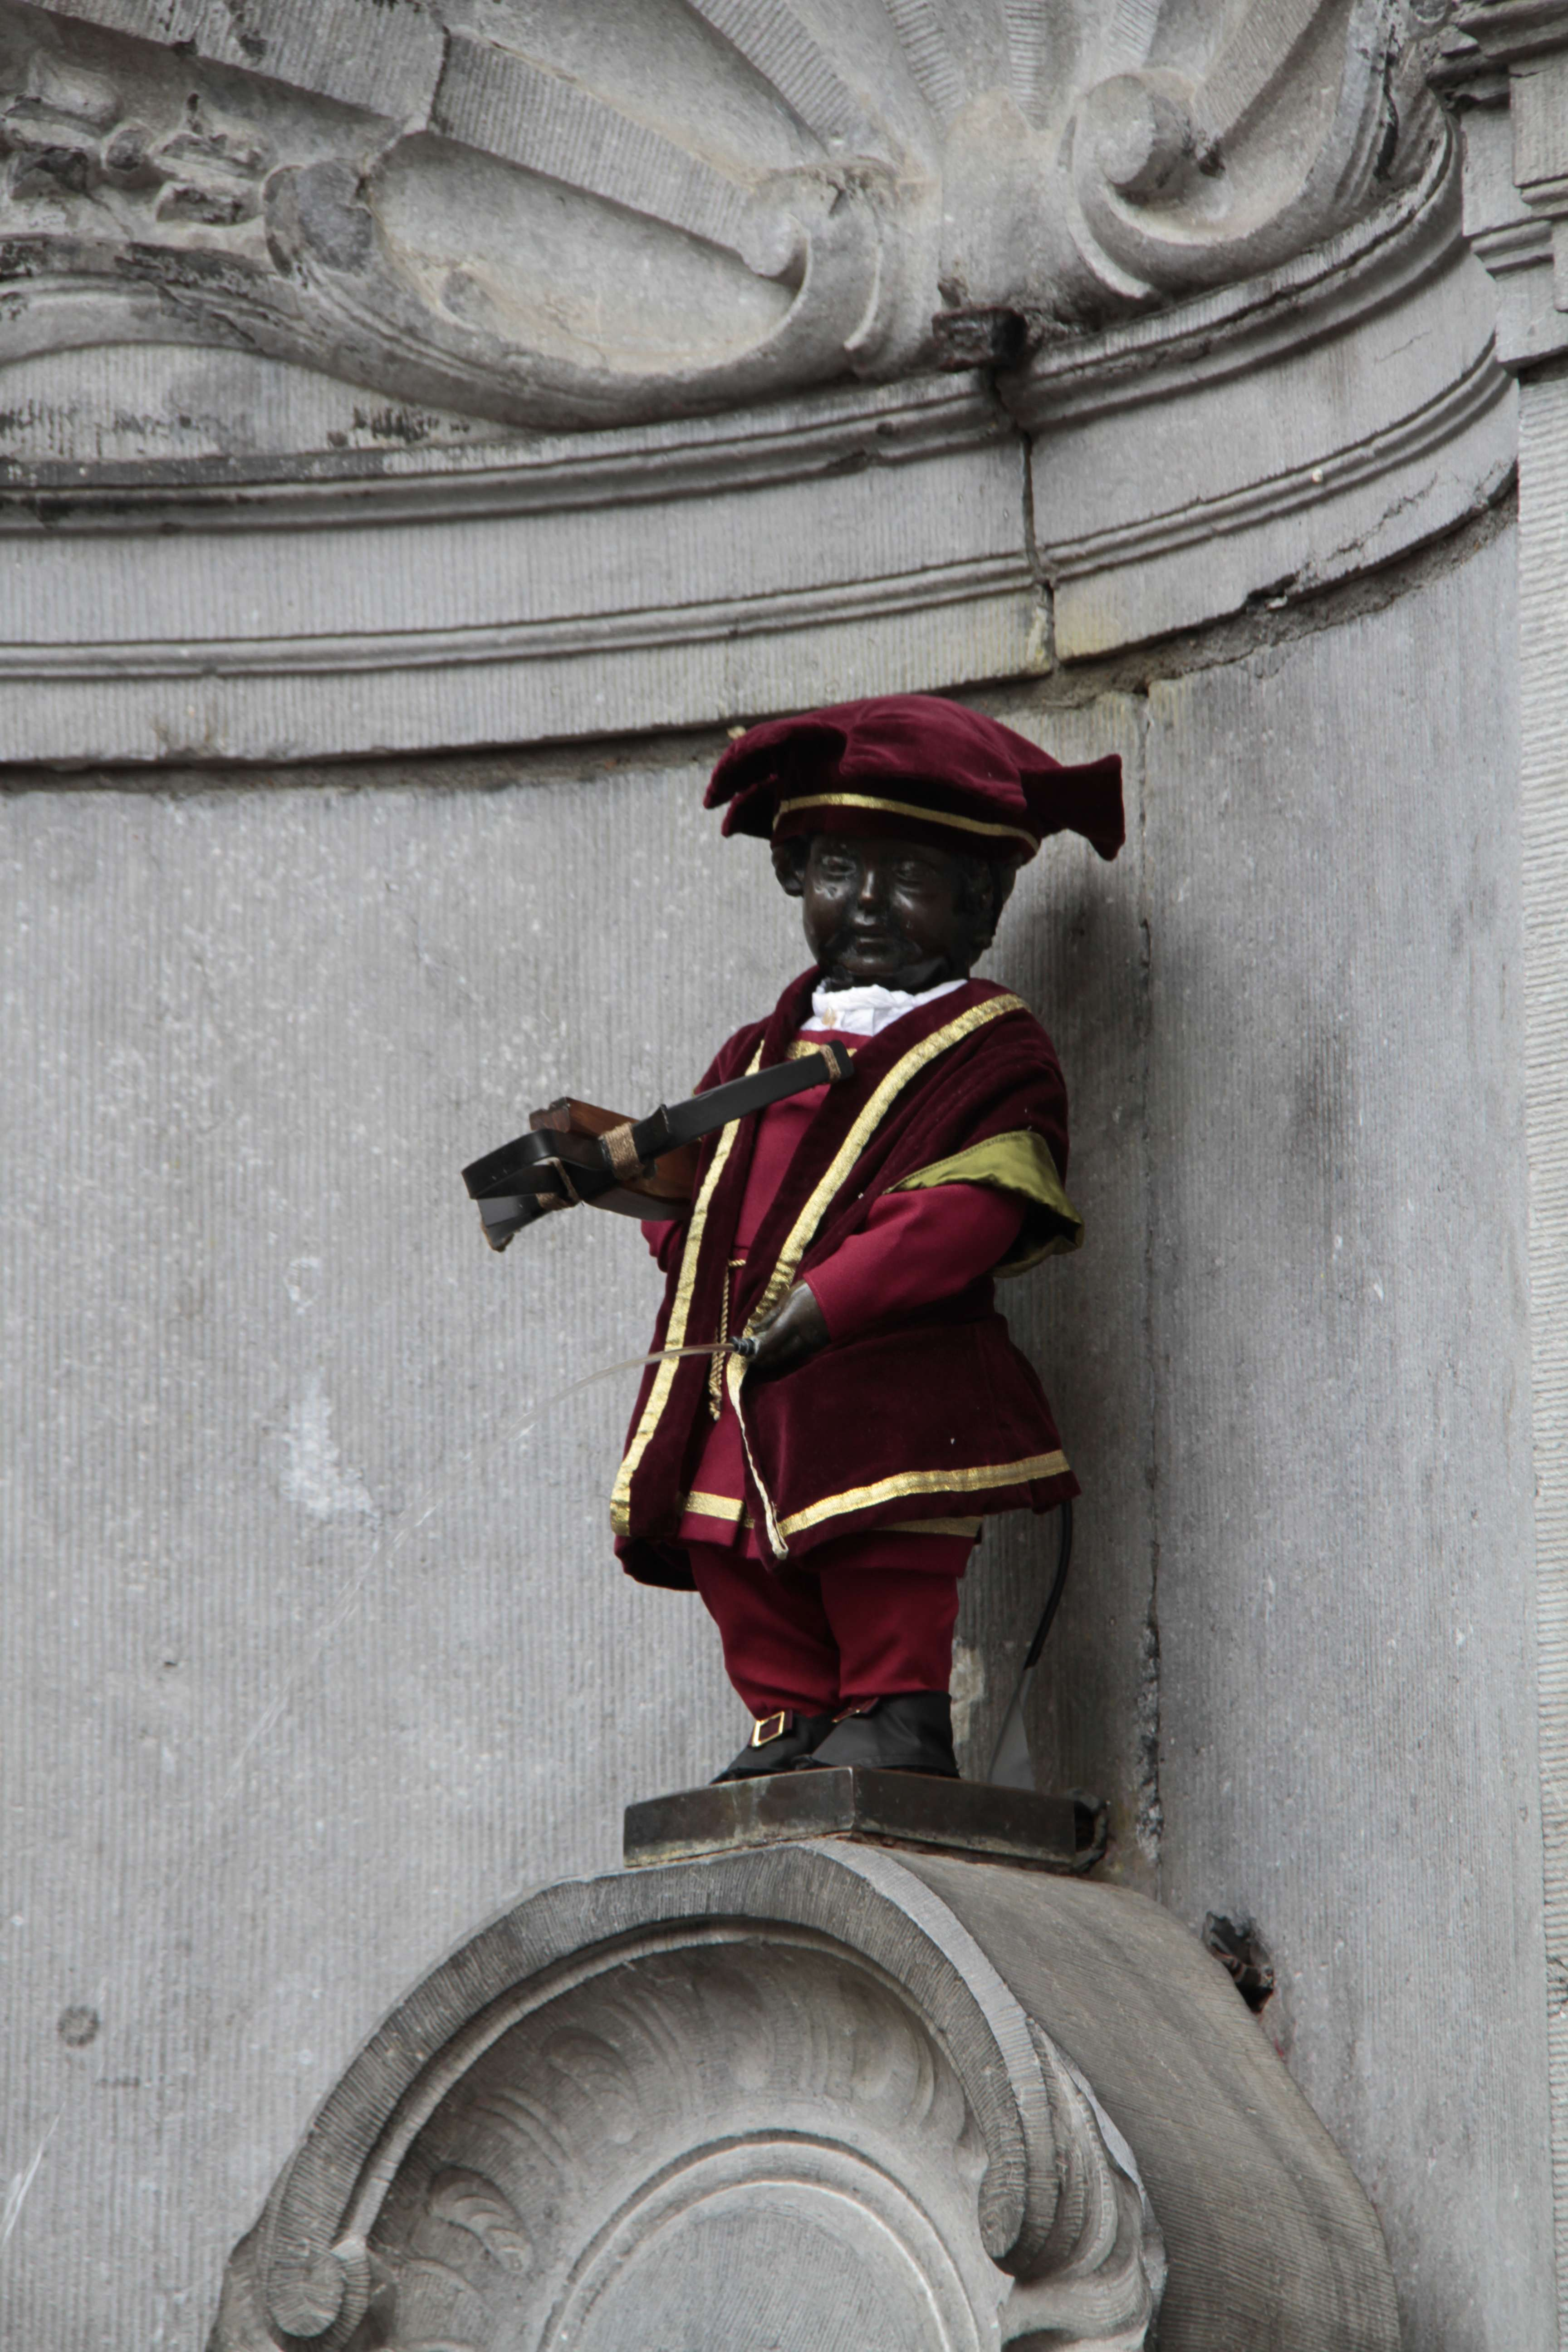 Belgique mai 2015_0234 Bruxelles Manneken Pis Grand Serment royal